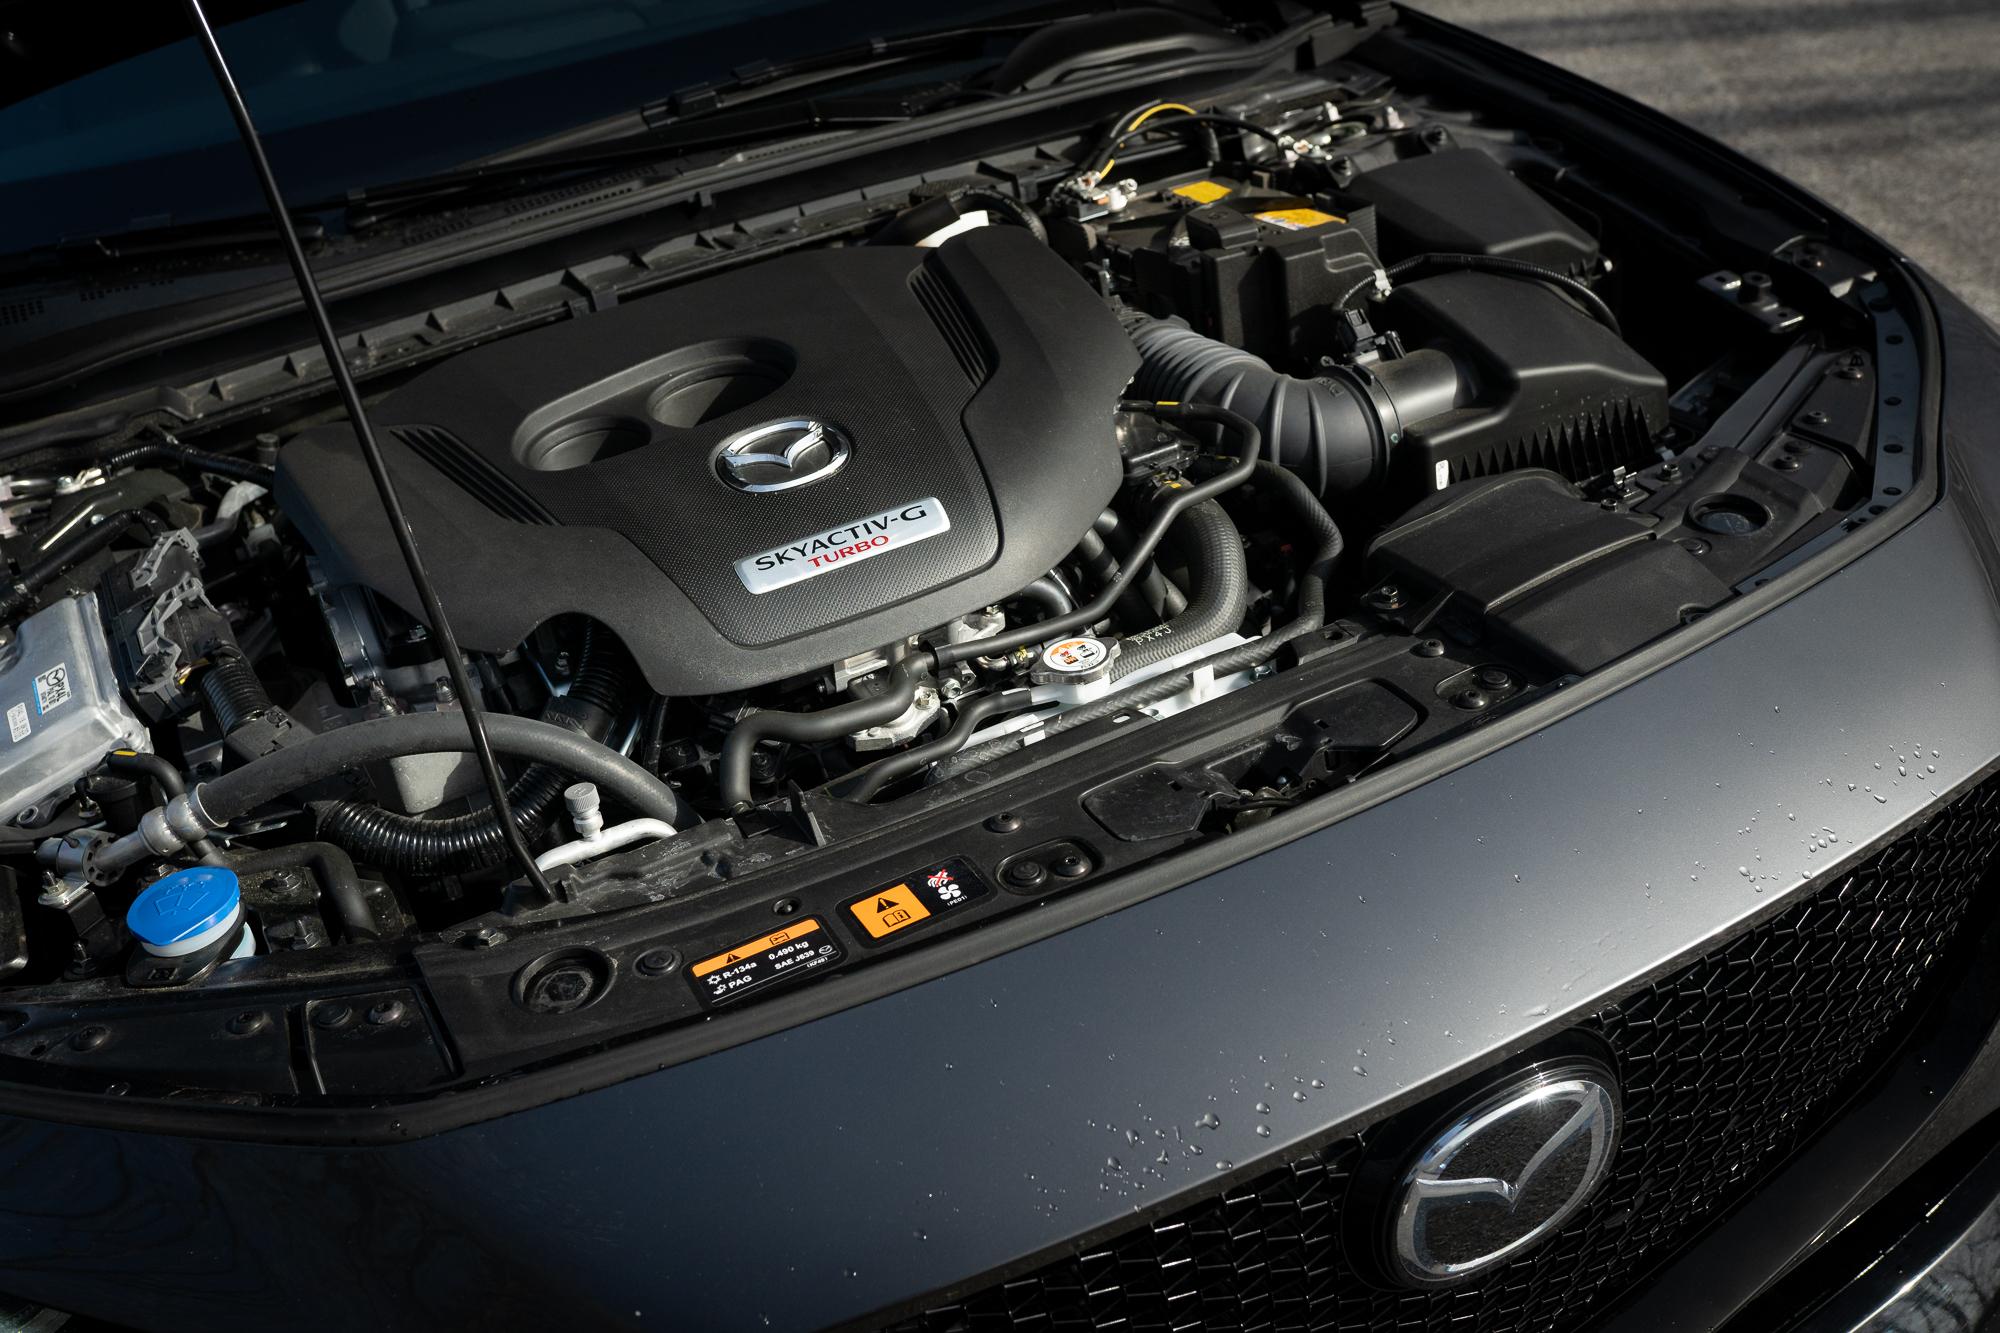 2021 Mazda 3 2.5T AWD engine bay